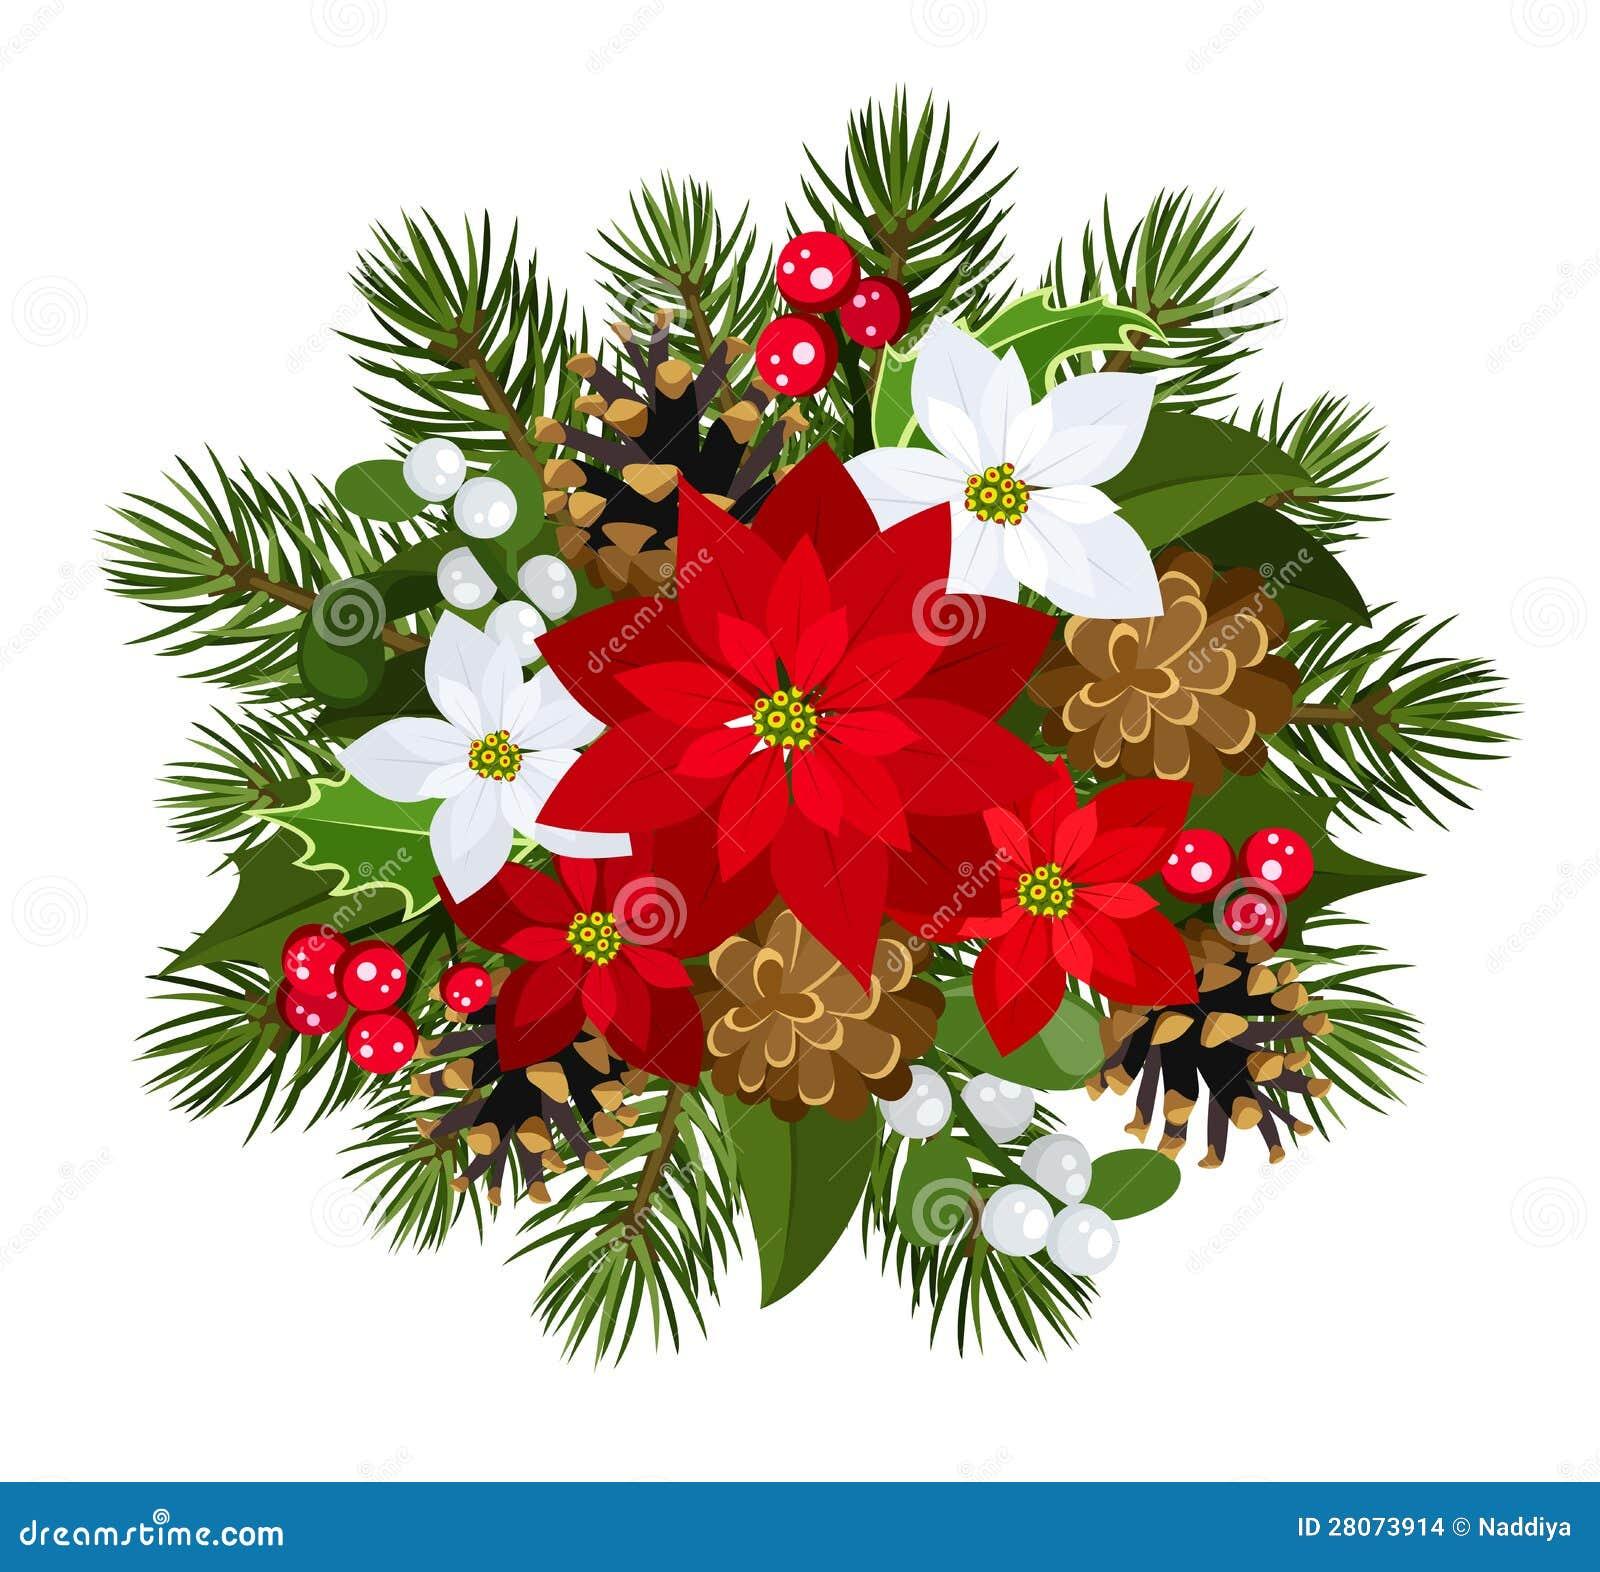 background christmas decoration - Christmas Decoration